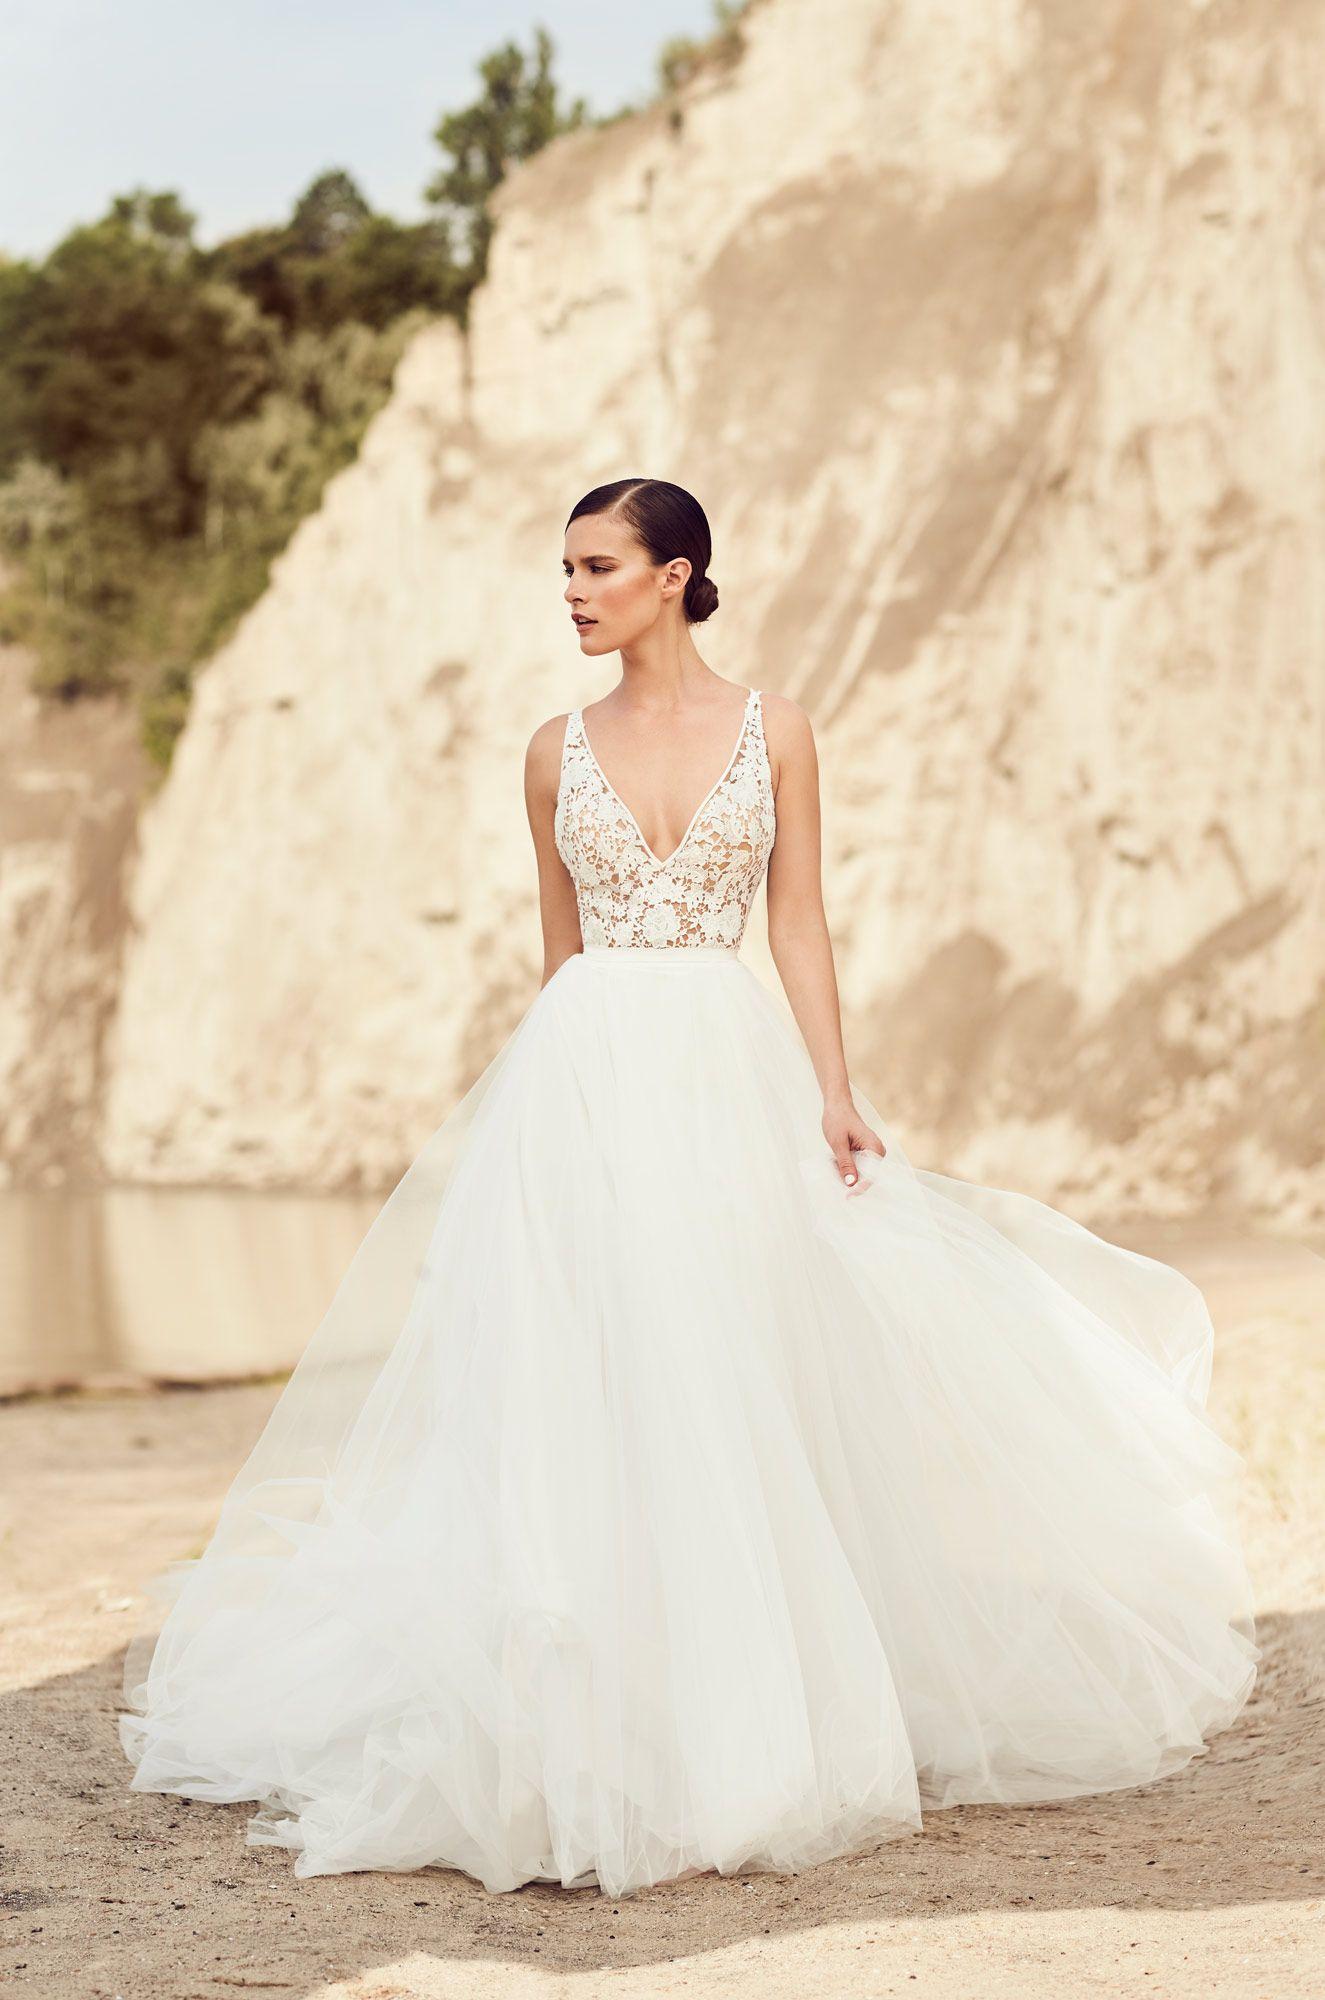 Mikaella Bridal Designer Wedding Dresses Made With Love In Canada Bridal Wedding Dresses Mikaella Bridal Bridal Dresses [ 2000 x 1325 Pixel ]